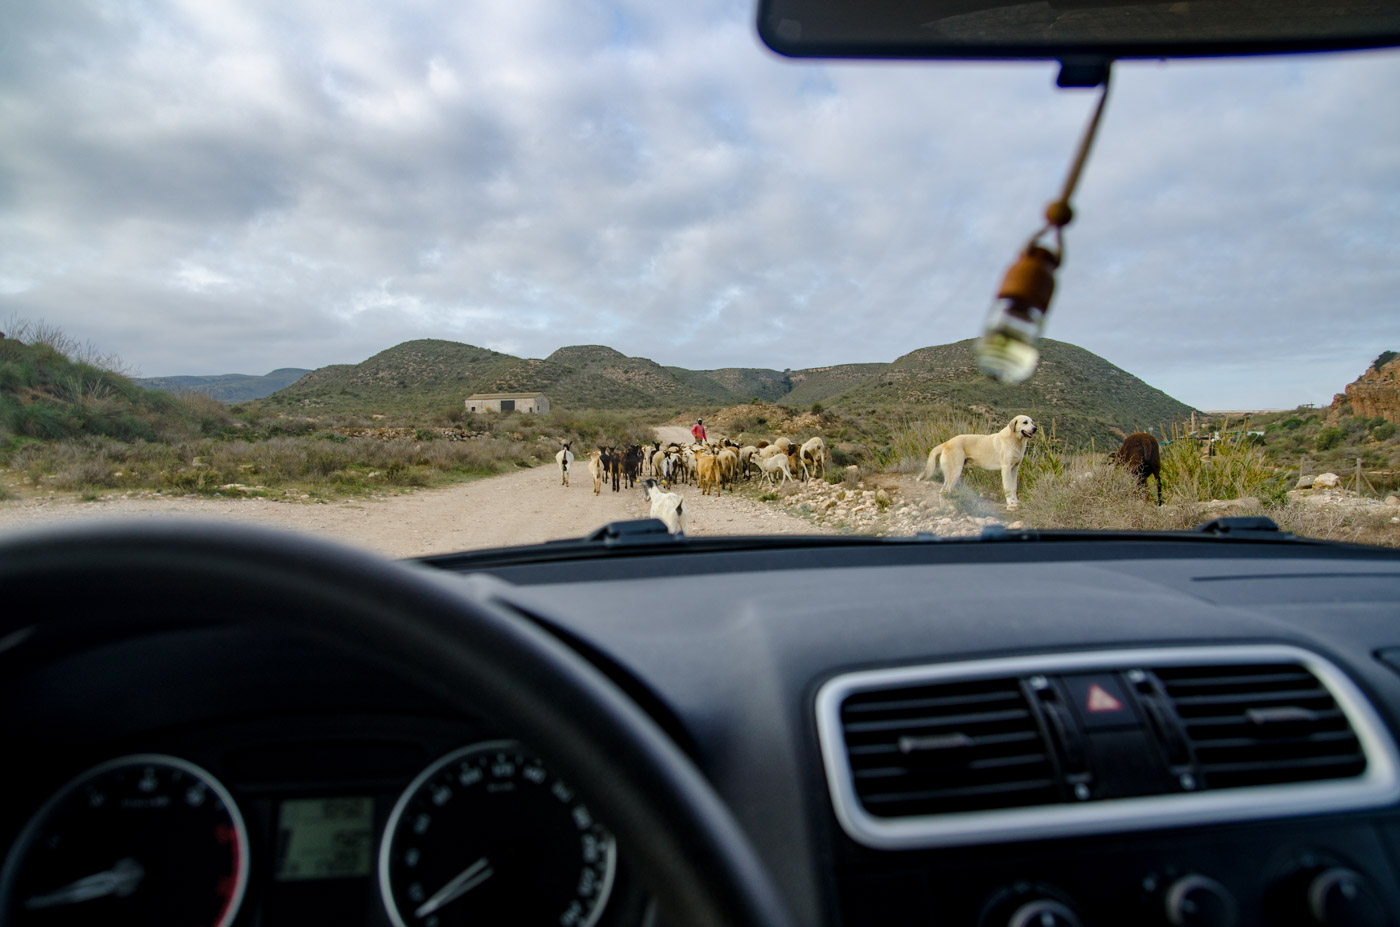 La Nómada Ventana Indiscreta - davidortega, fotografía